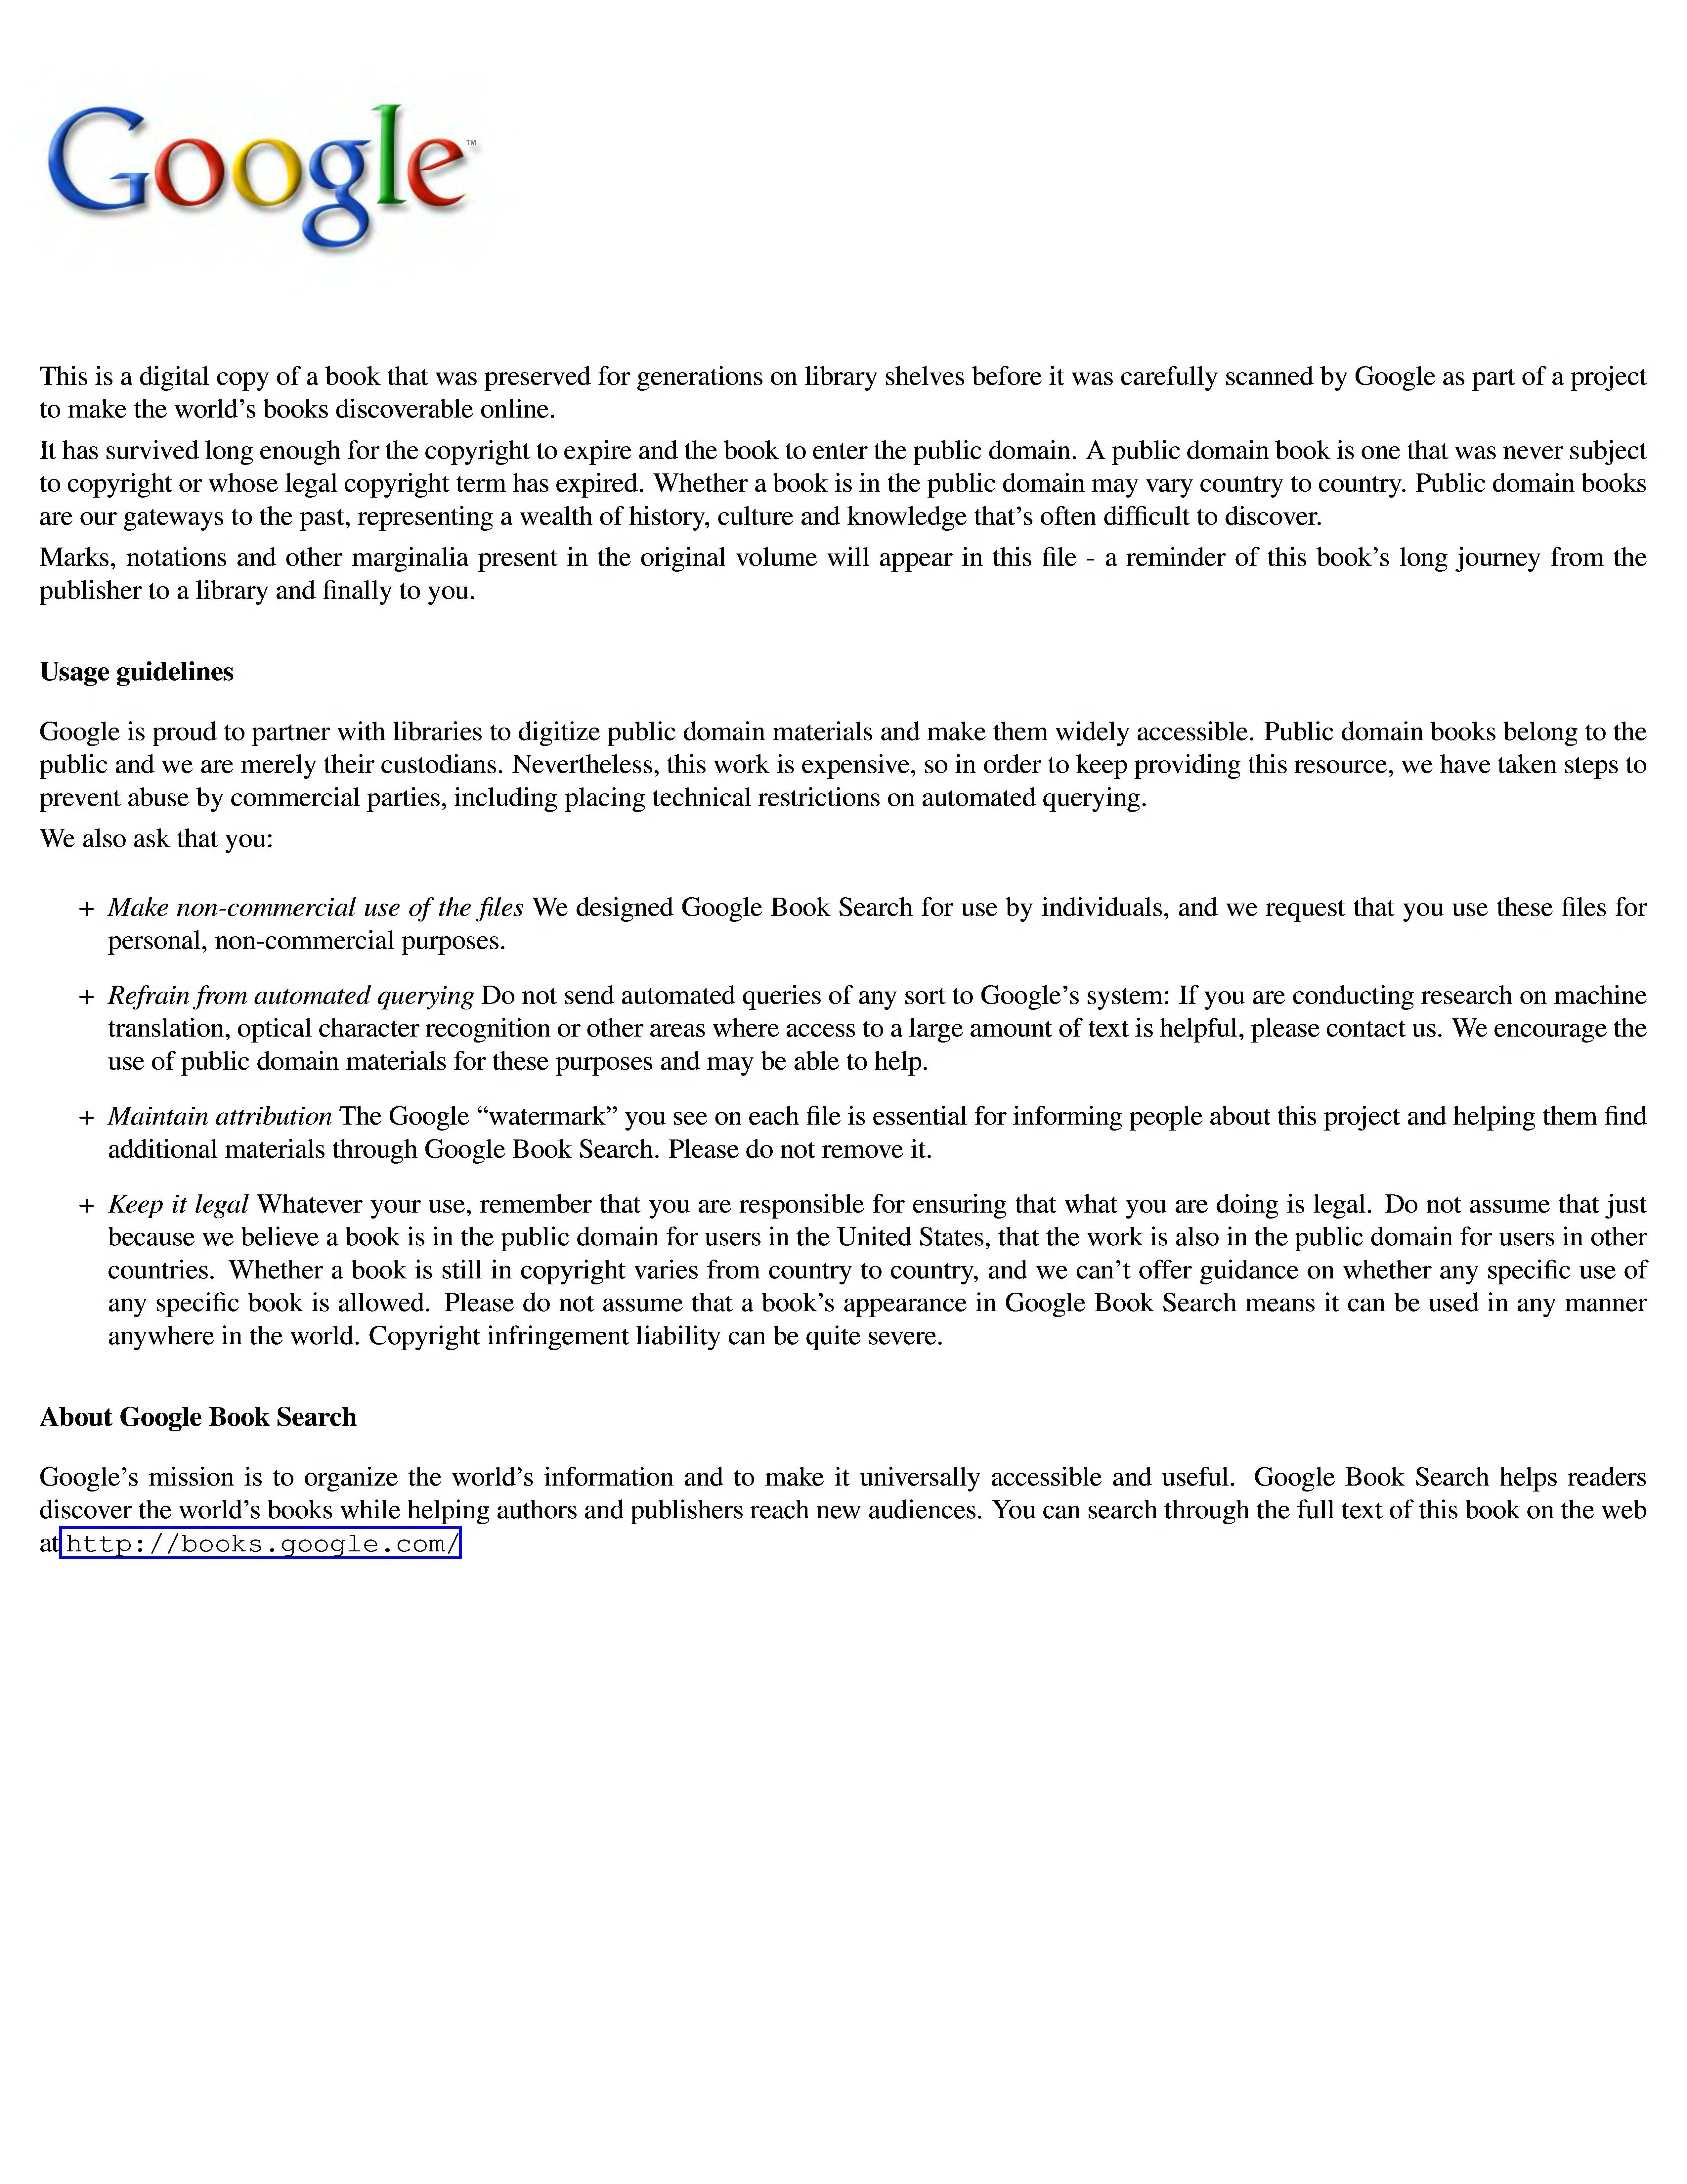 File:Ranjit - A Sanskrit and Gujarati Dictionary djvu - Wikimedia